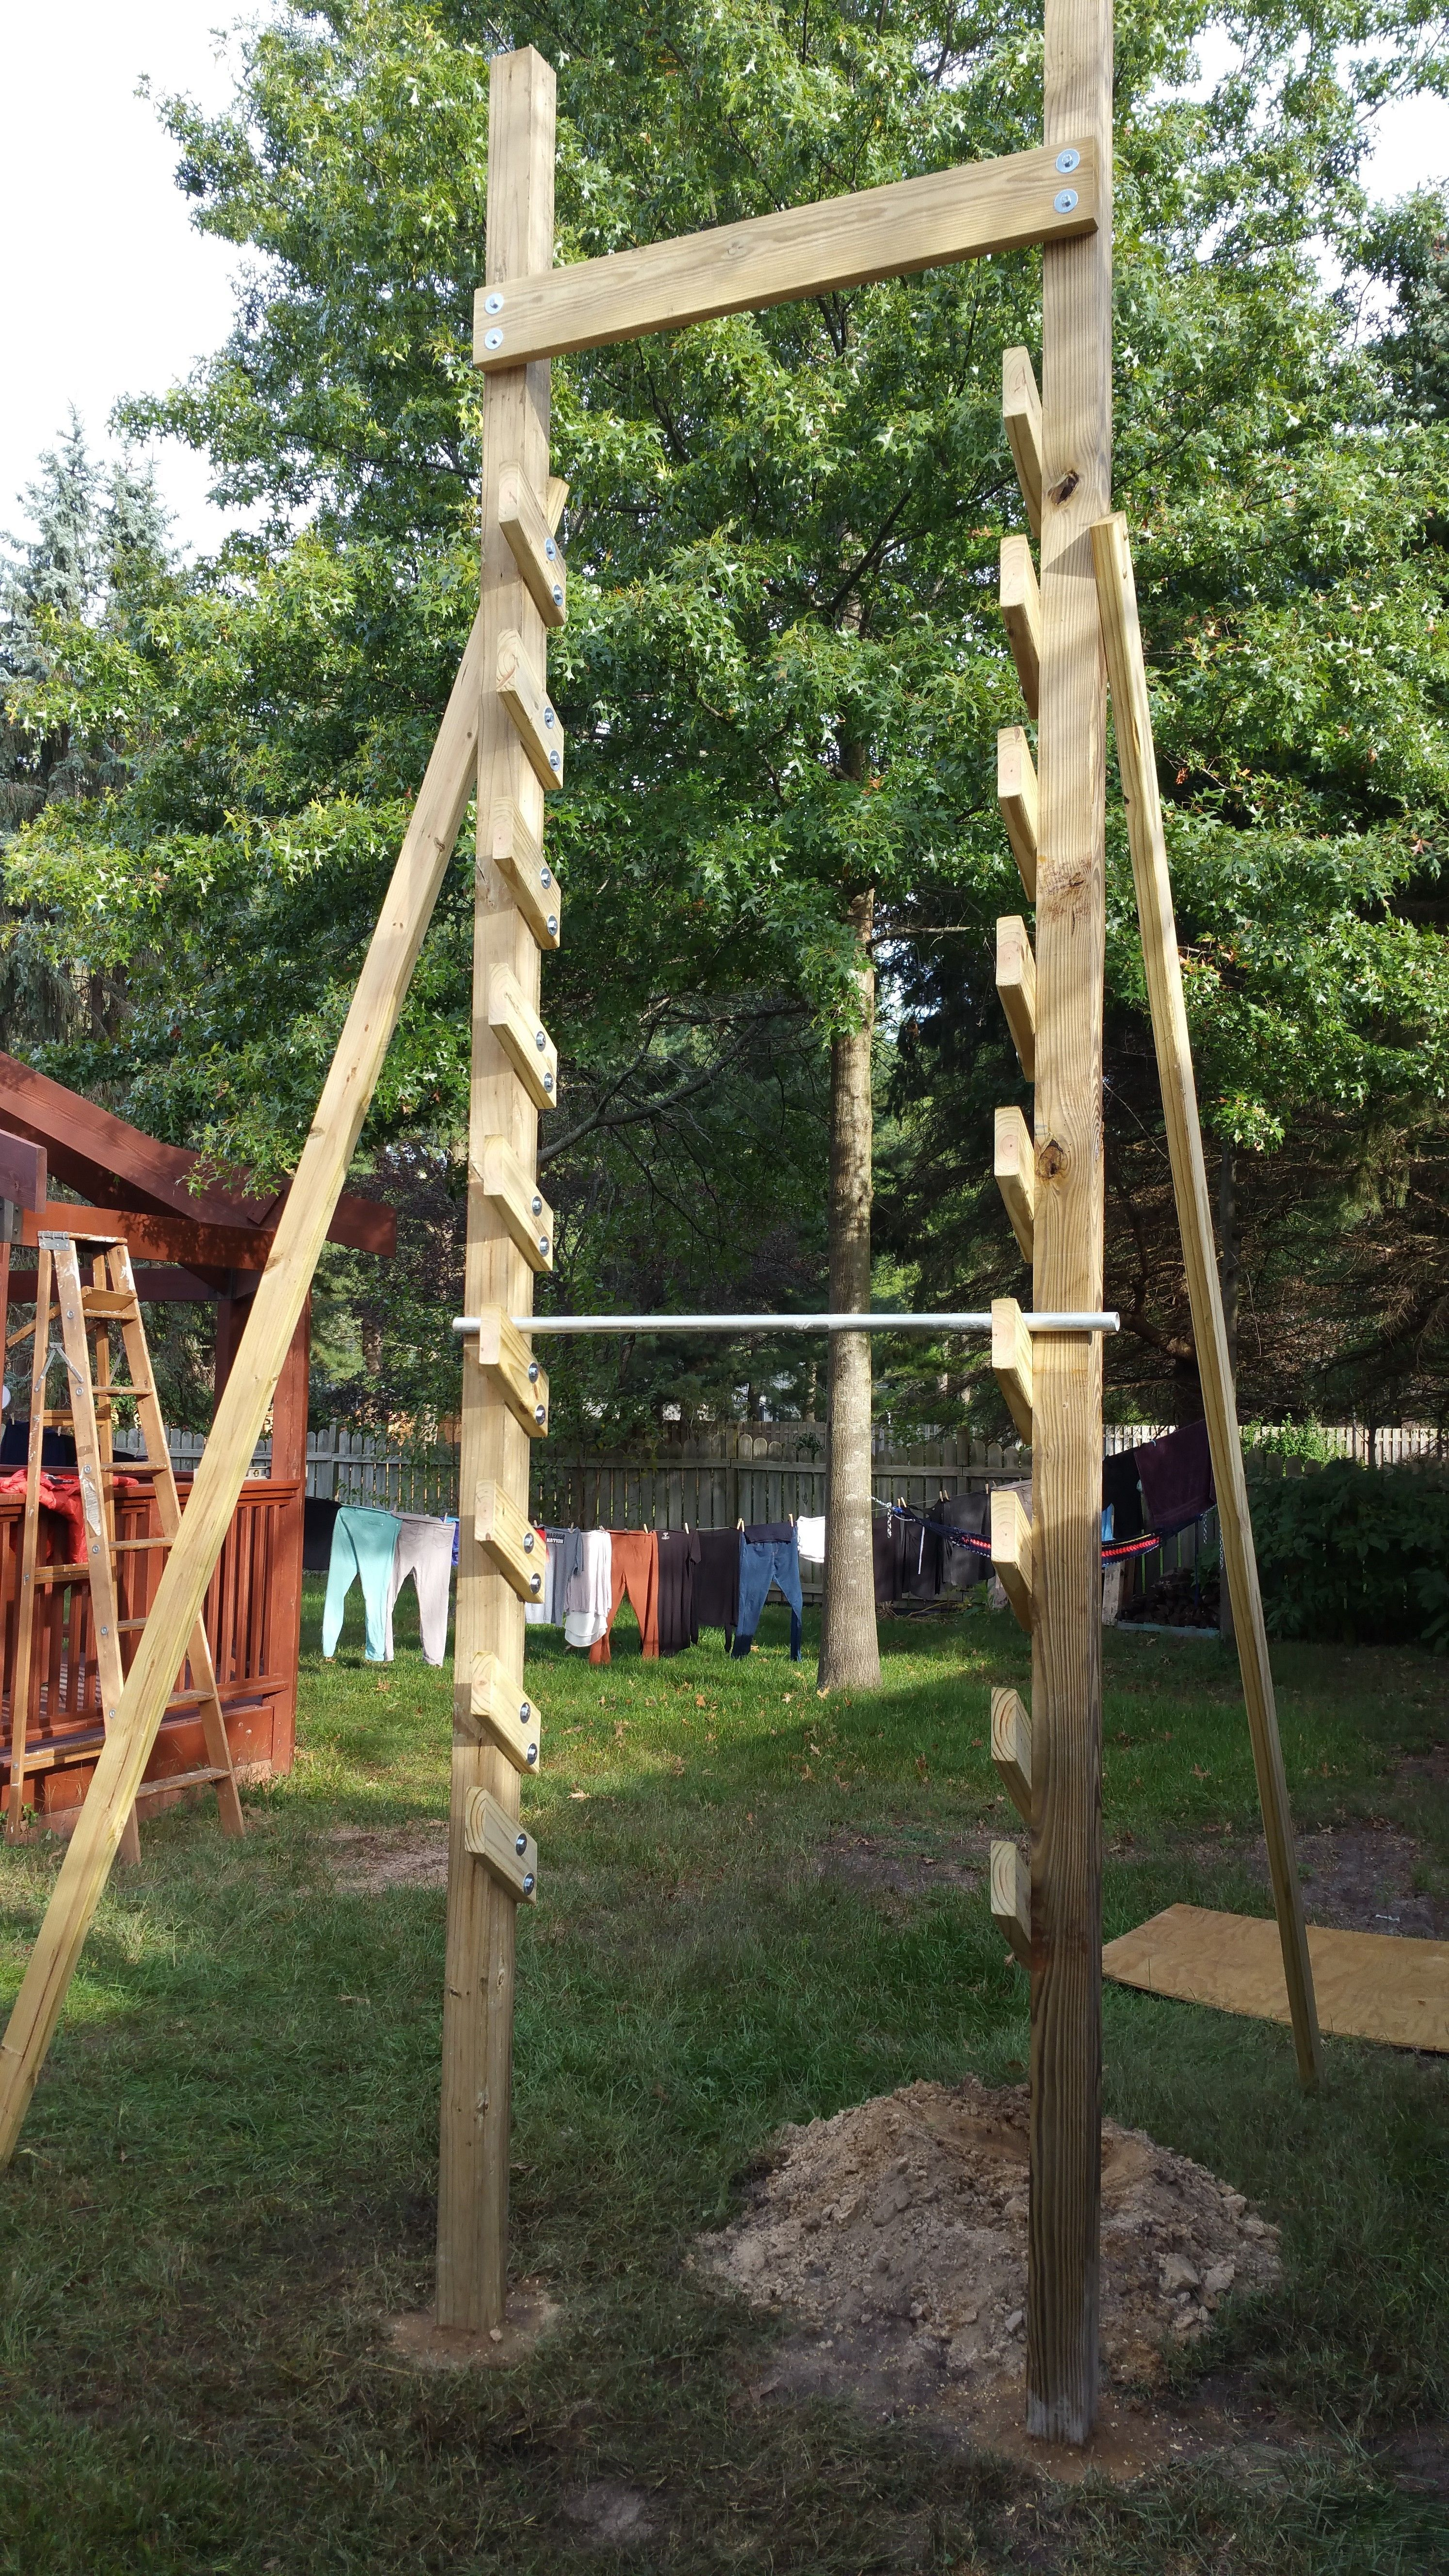 #Backyard #Build #kids backyard obstacle course #Ladder # ...